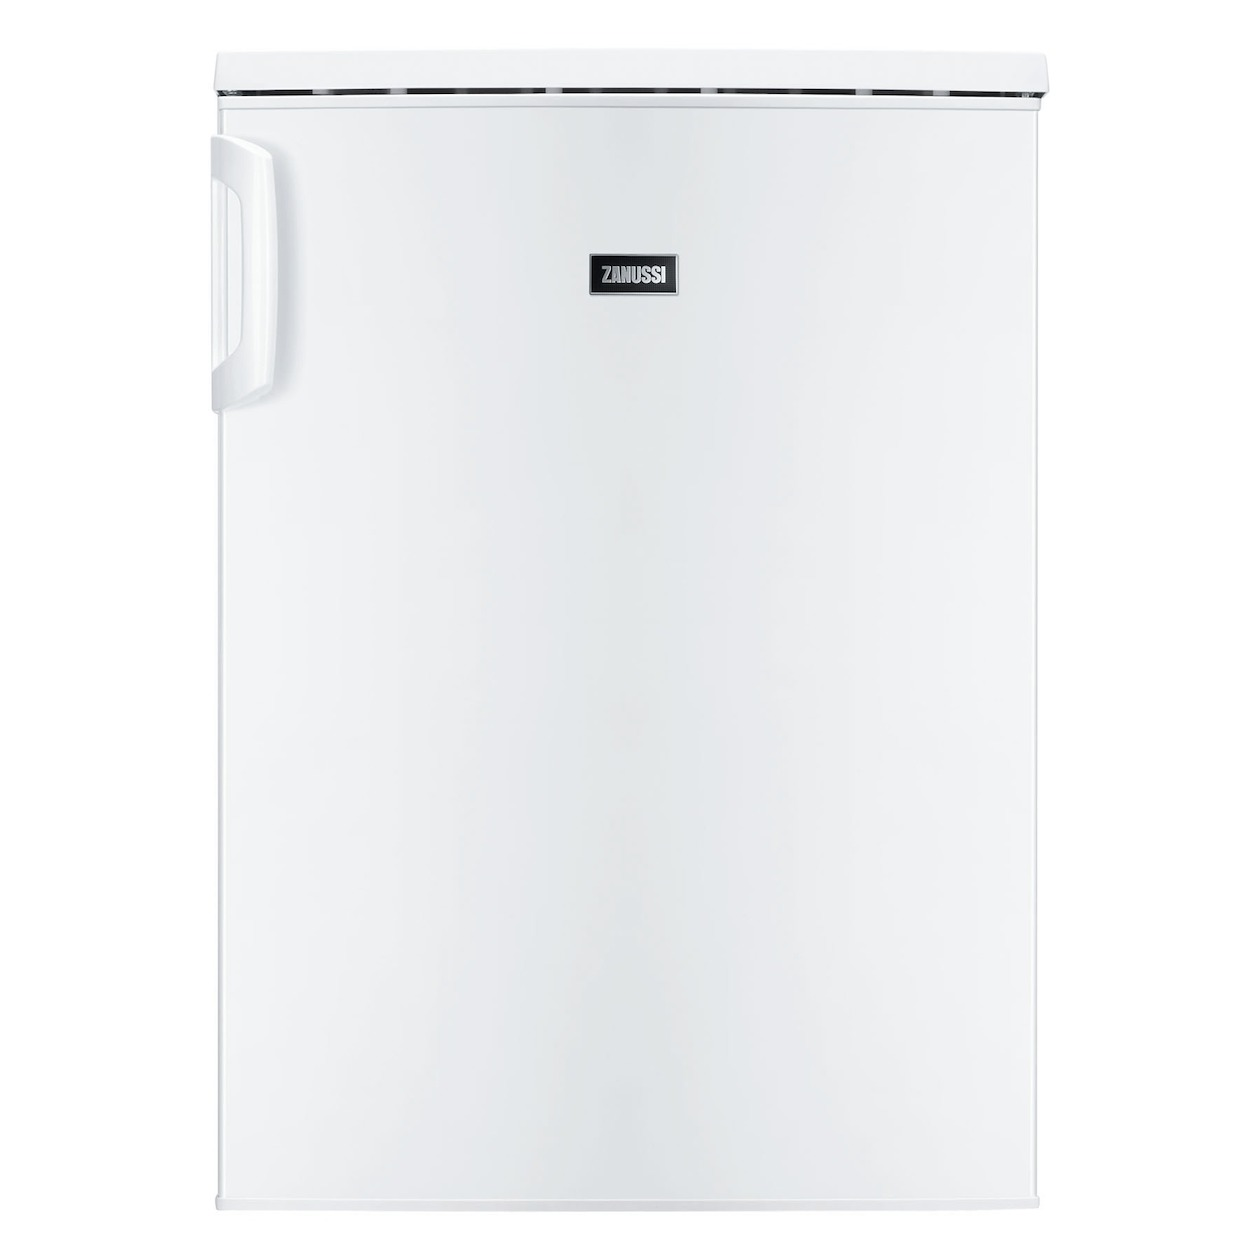 Zanussi koelkast met vriesvak ZRG14801WA - Prijsvergelijk